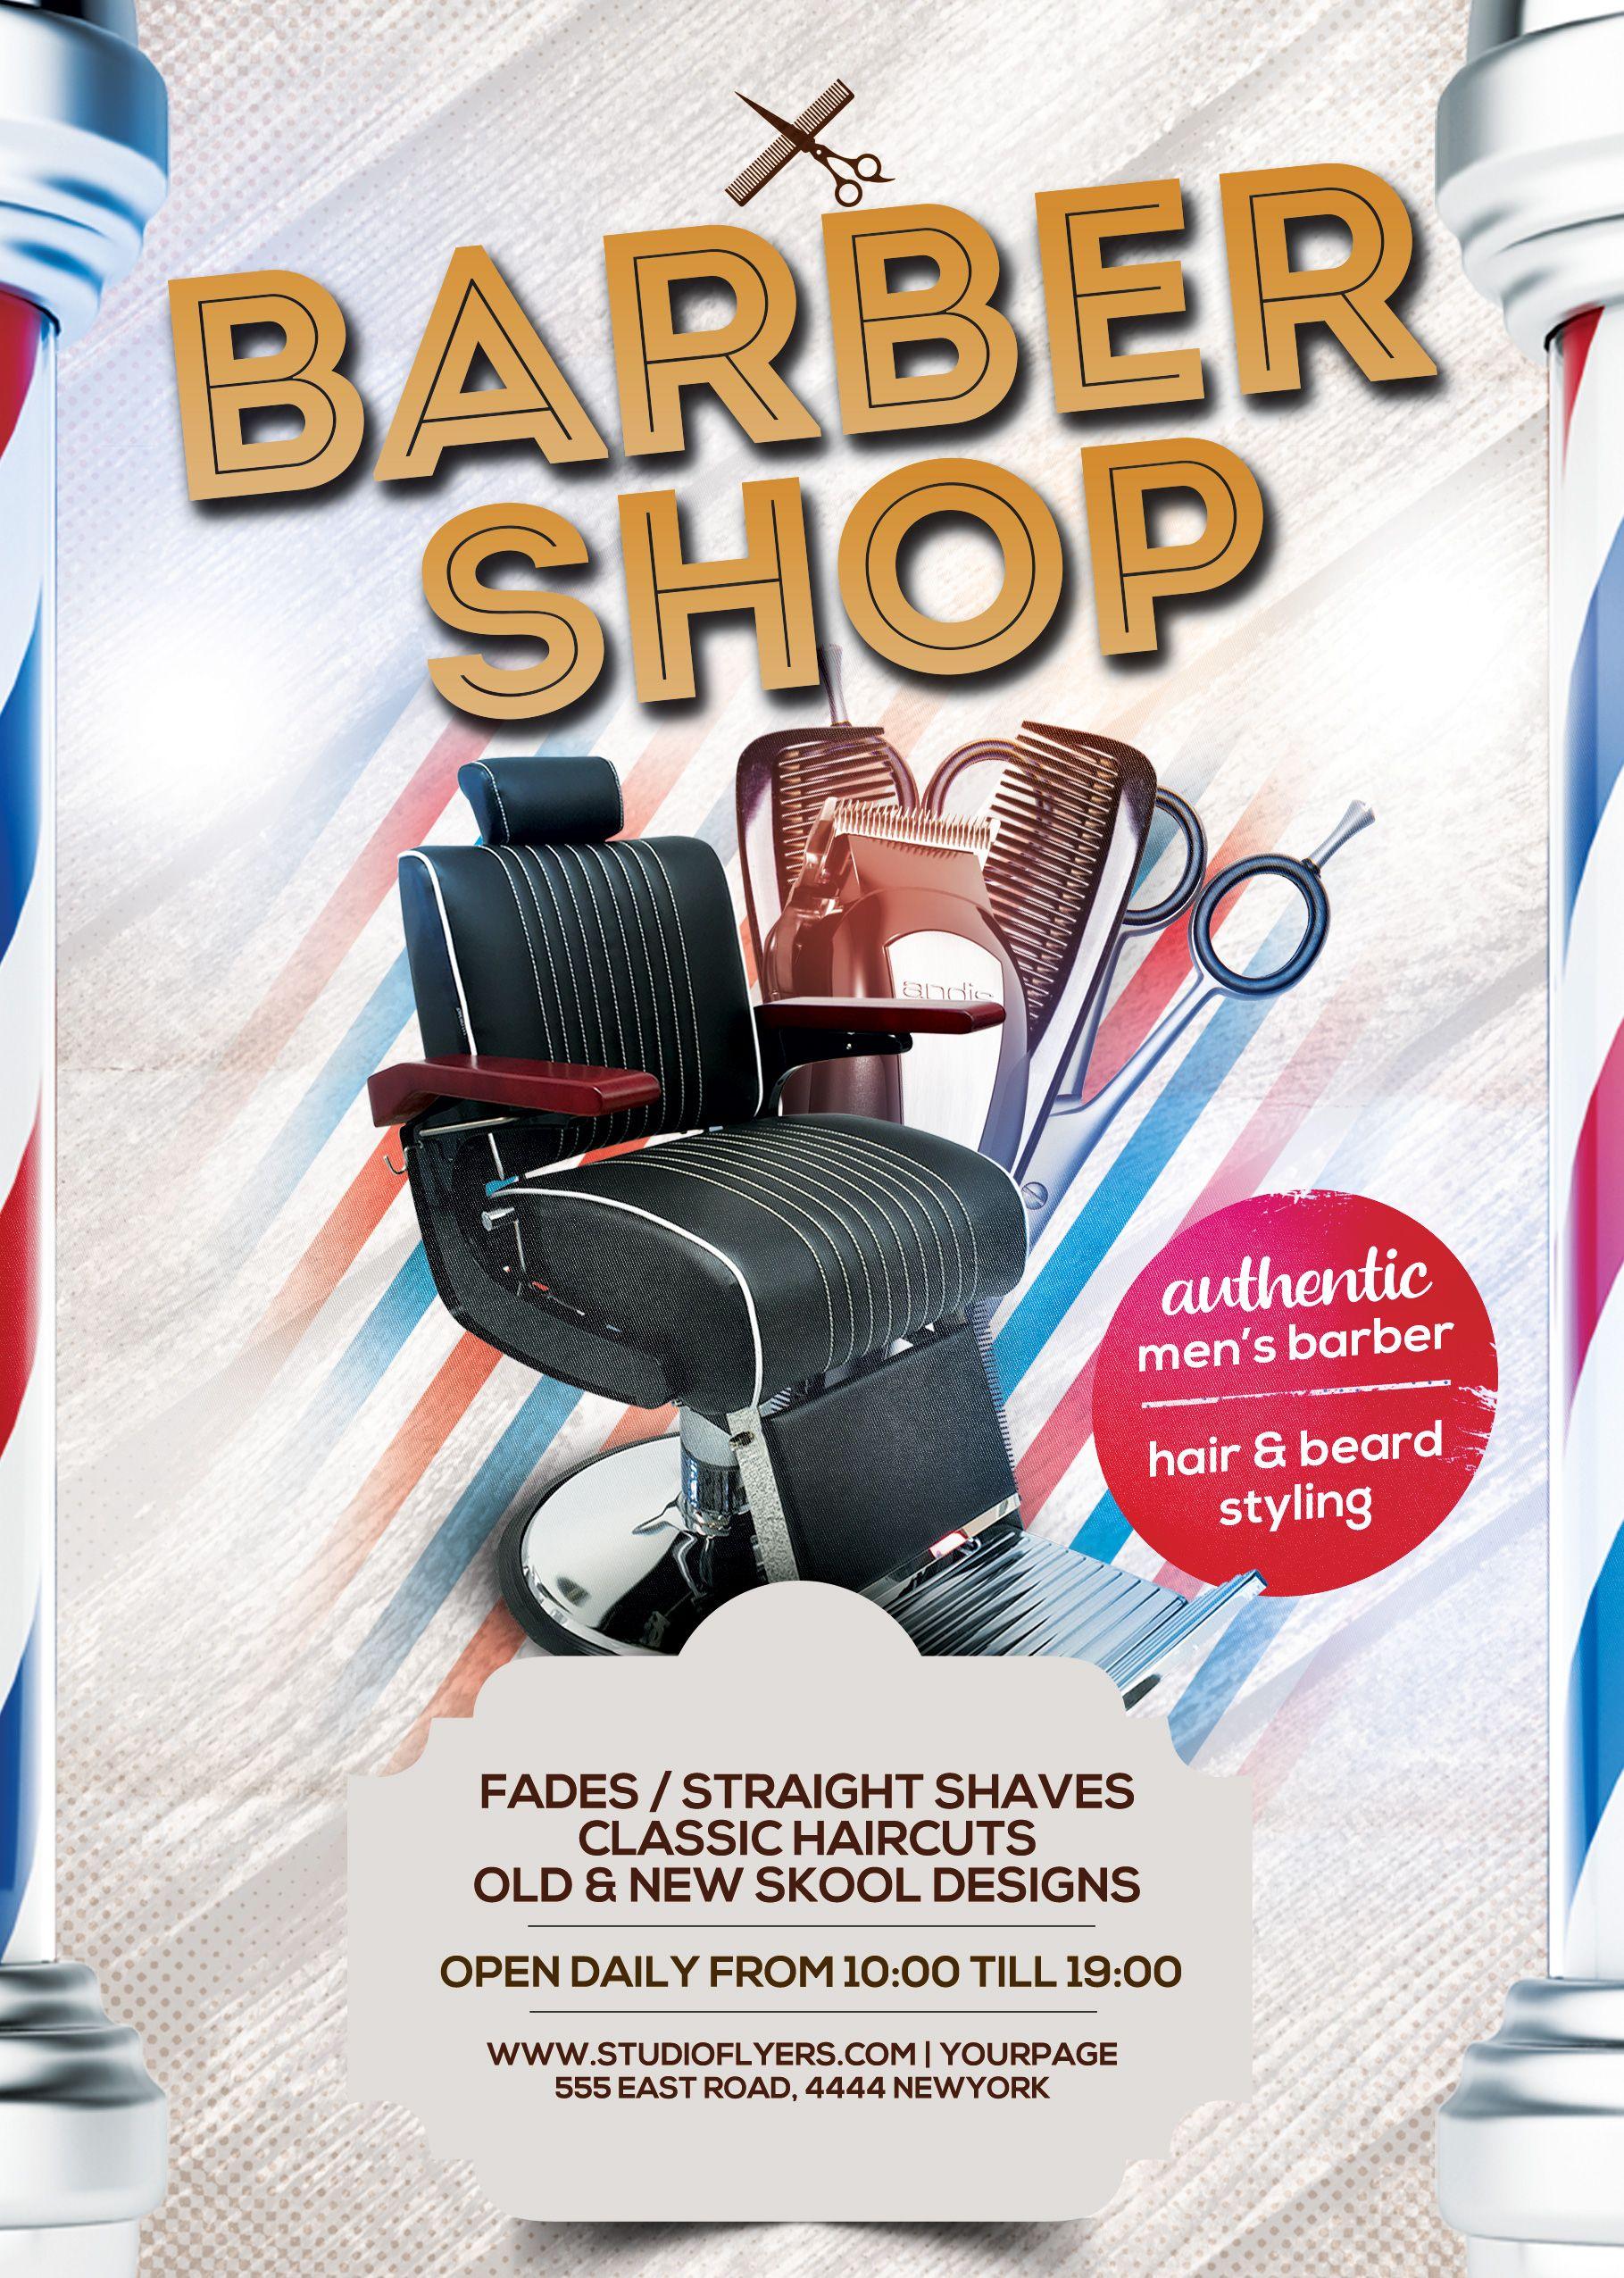 Barbershop Free Psd Flyer Template Studioflyers Com Free Psd Flyer Templates Free Psd Flyer Psd Flyer Templates Barber shop flyer free template